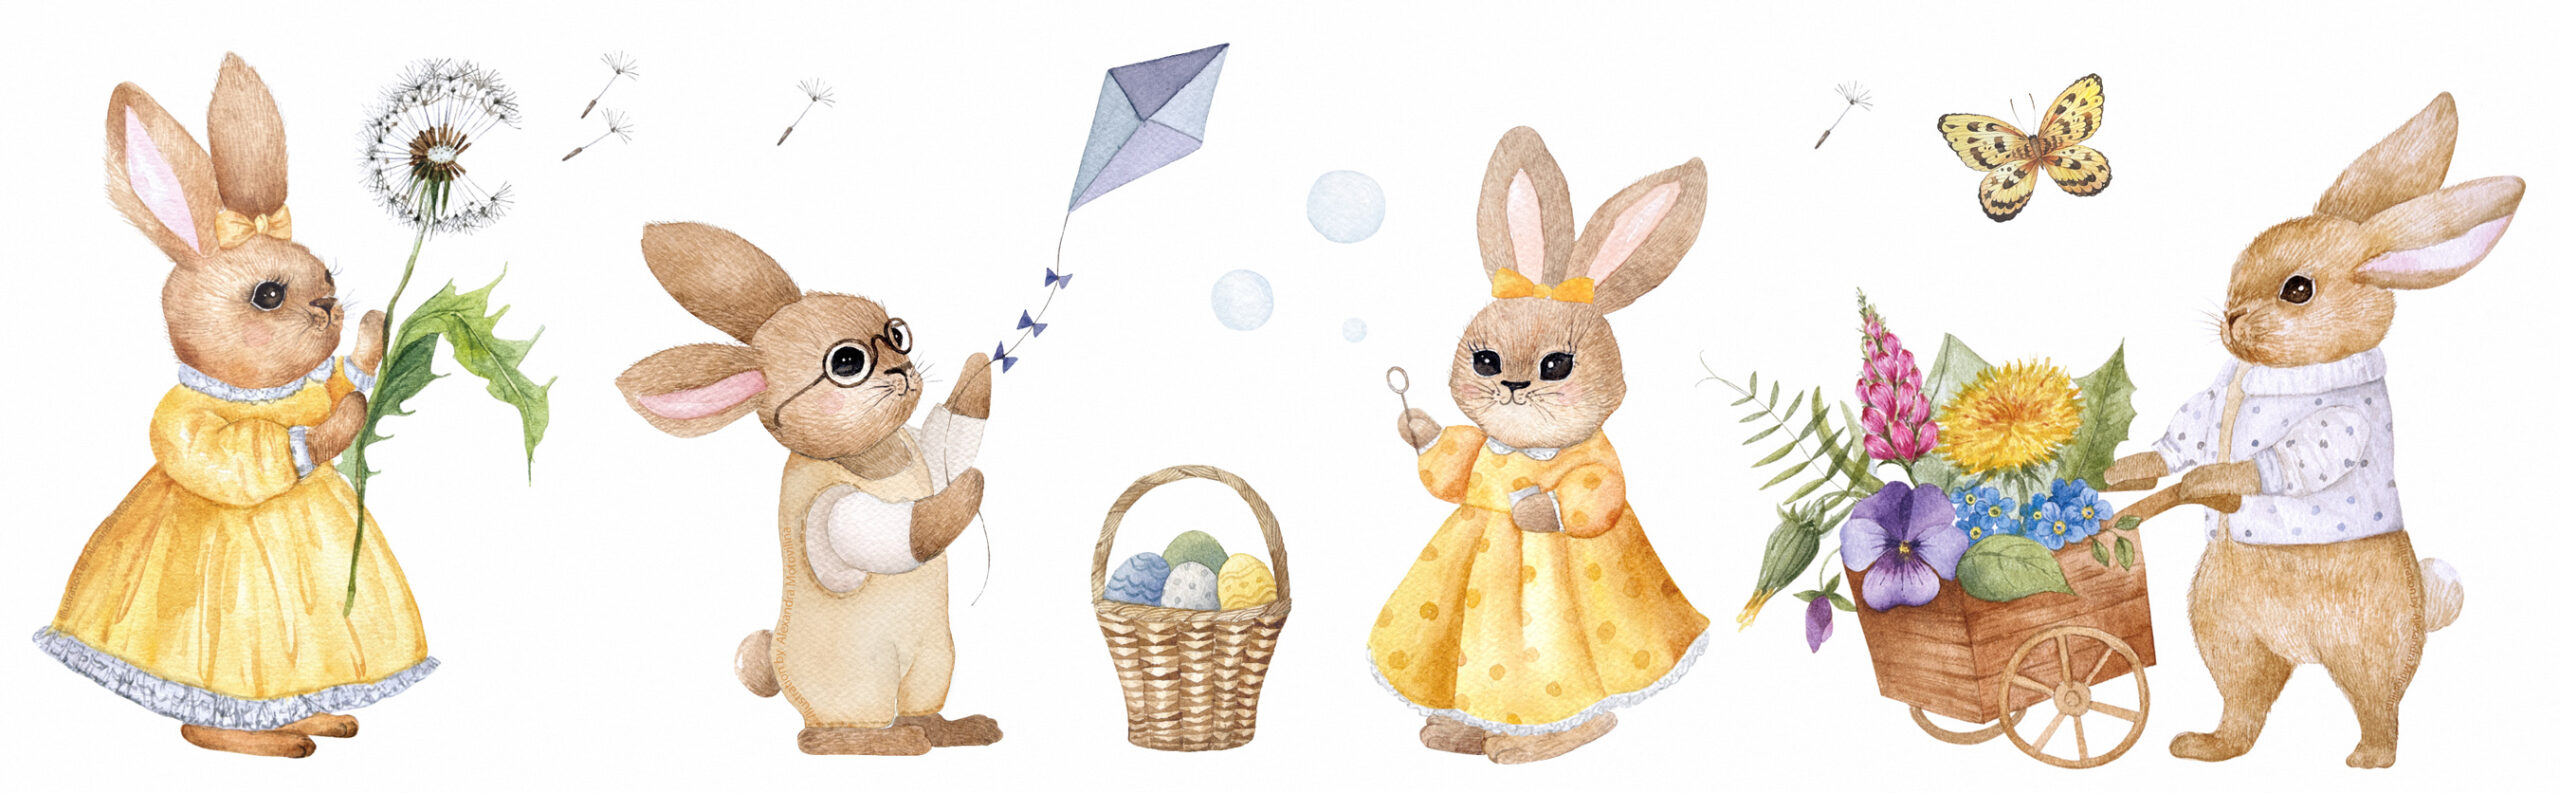 Alexandra-Motovilina_Easter-illustrations-with-rabbits